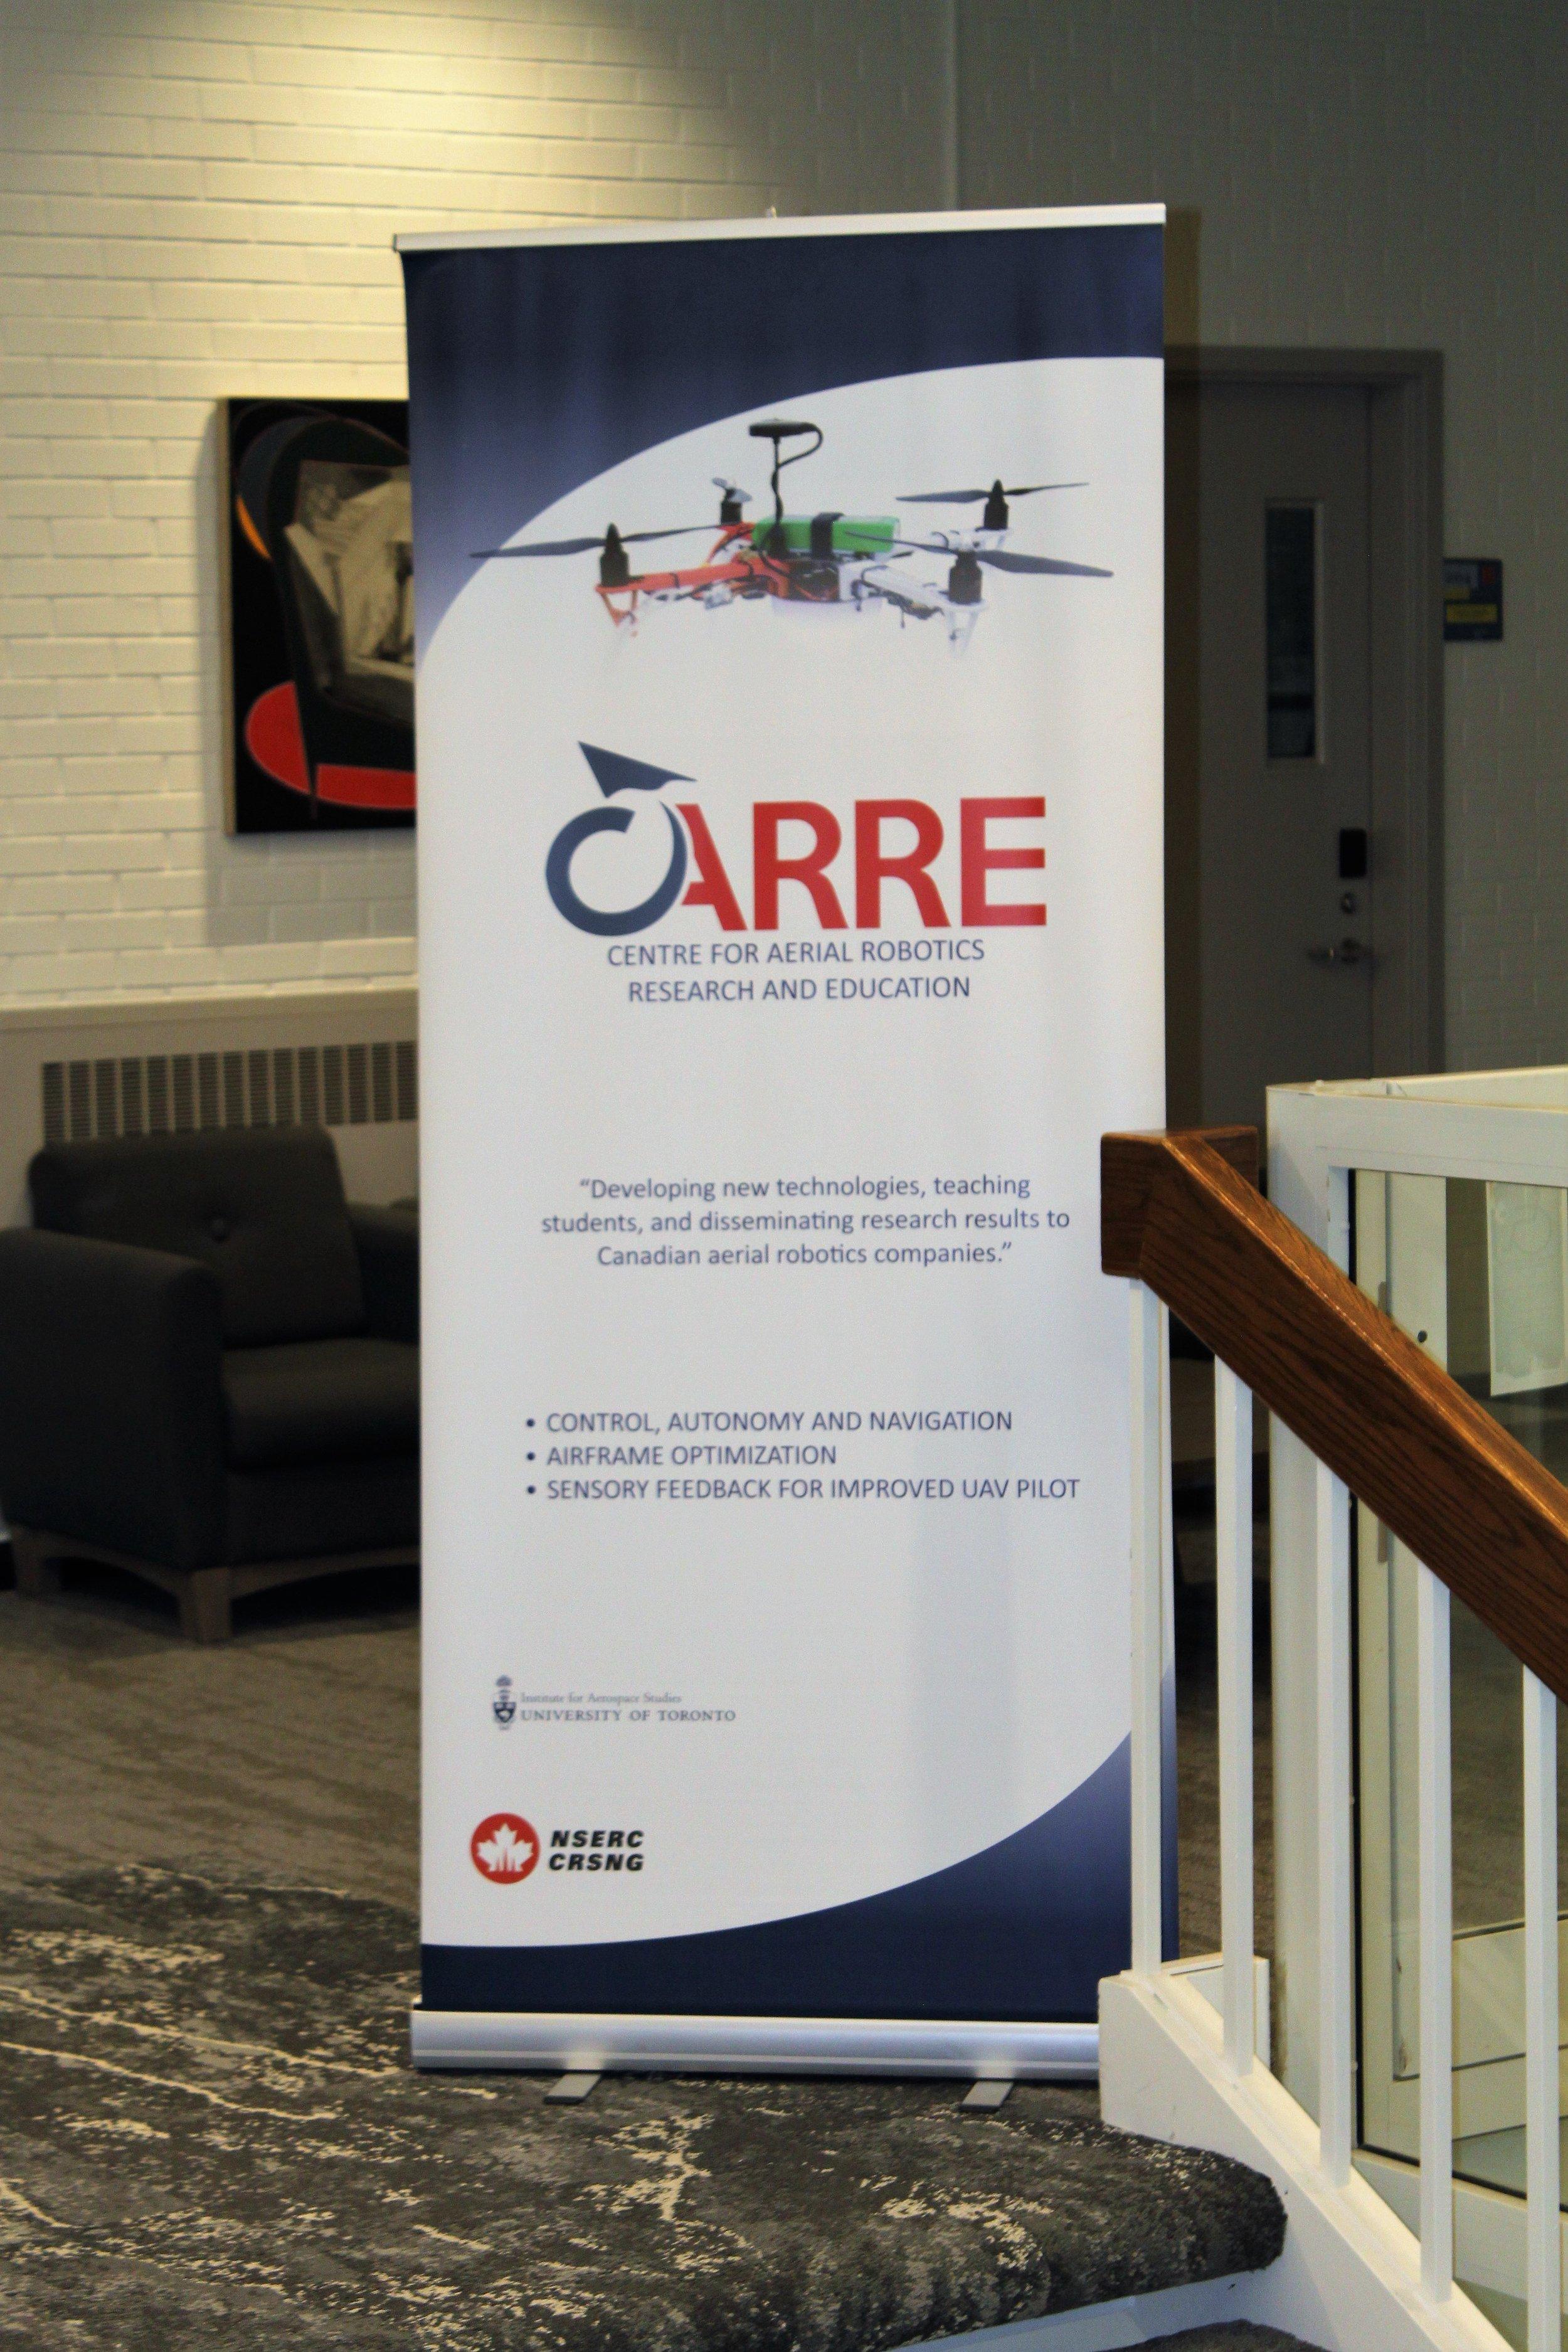 International Symposium on Aerial Robotics — CARRE